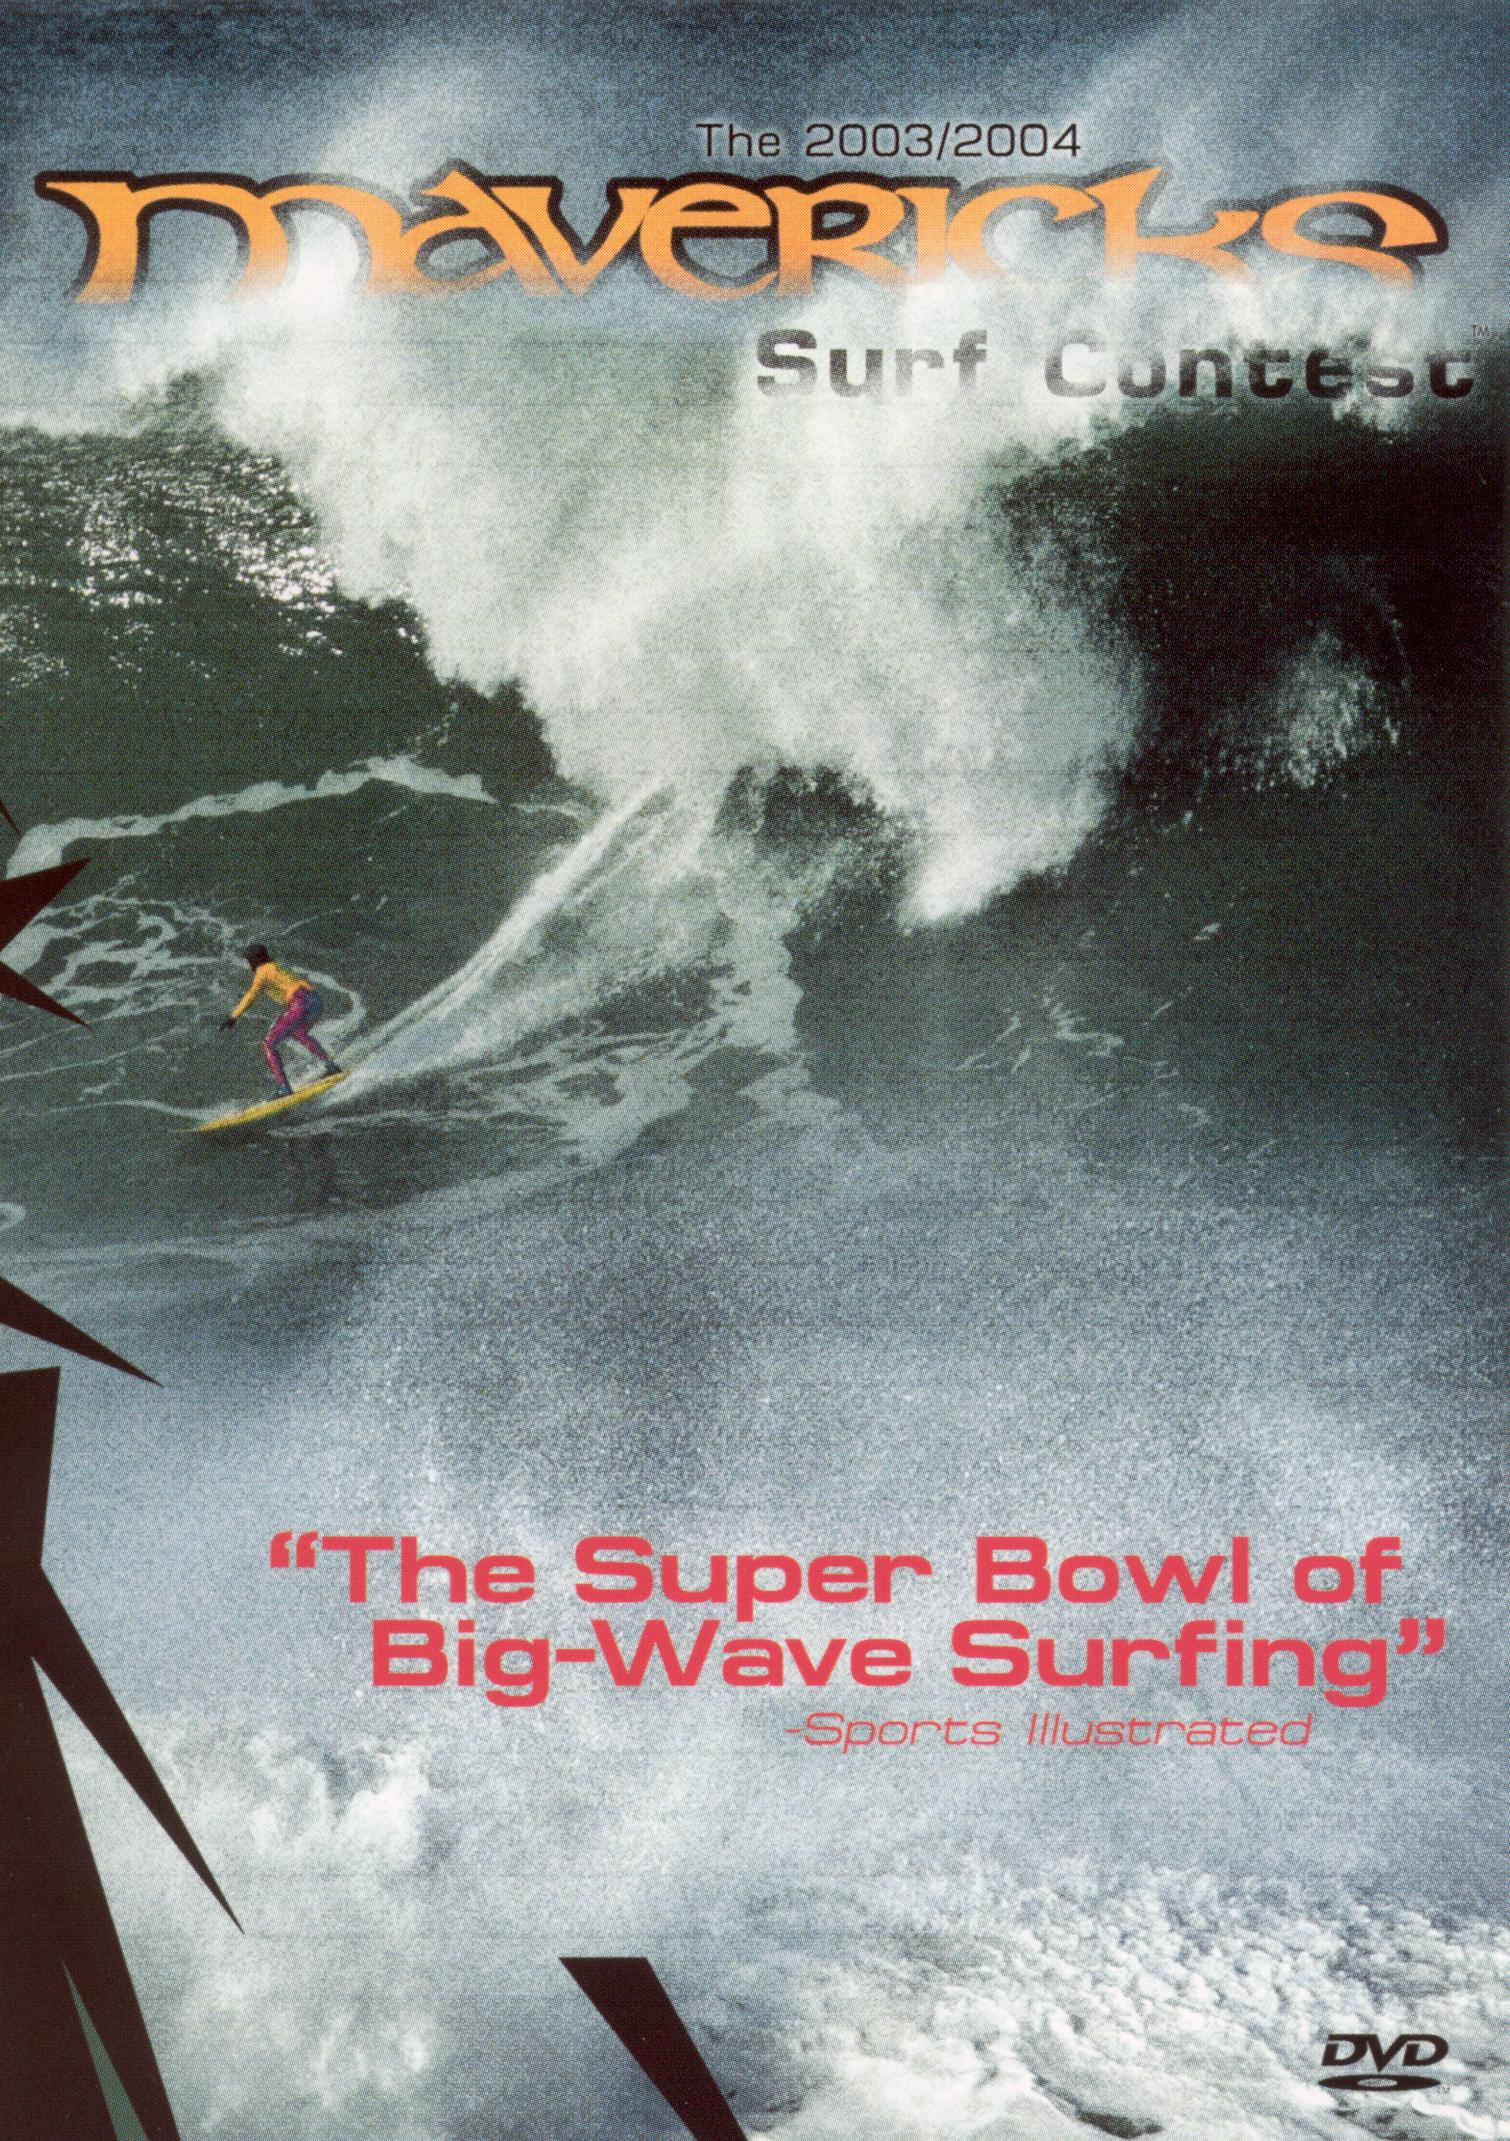 The Mavericks Surf Contest